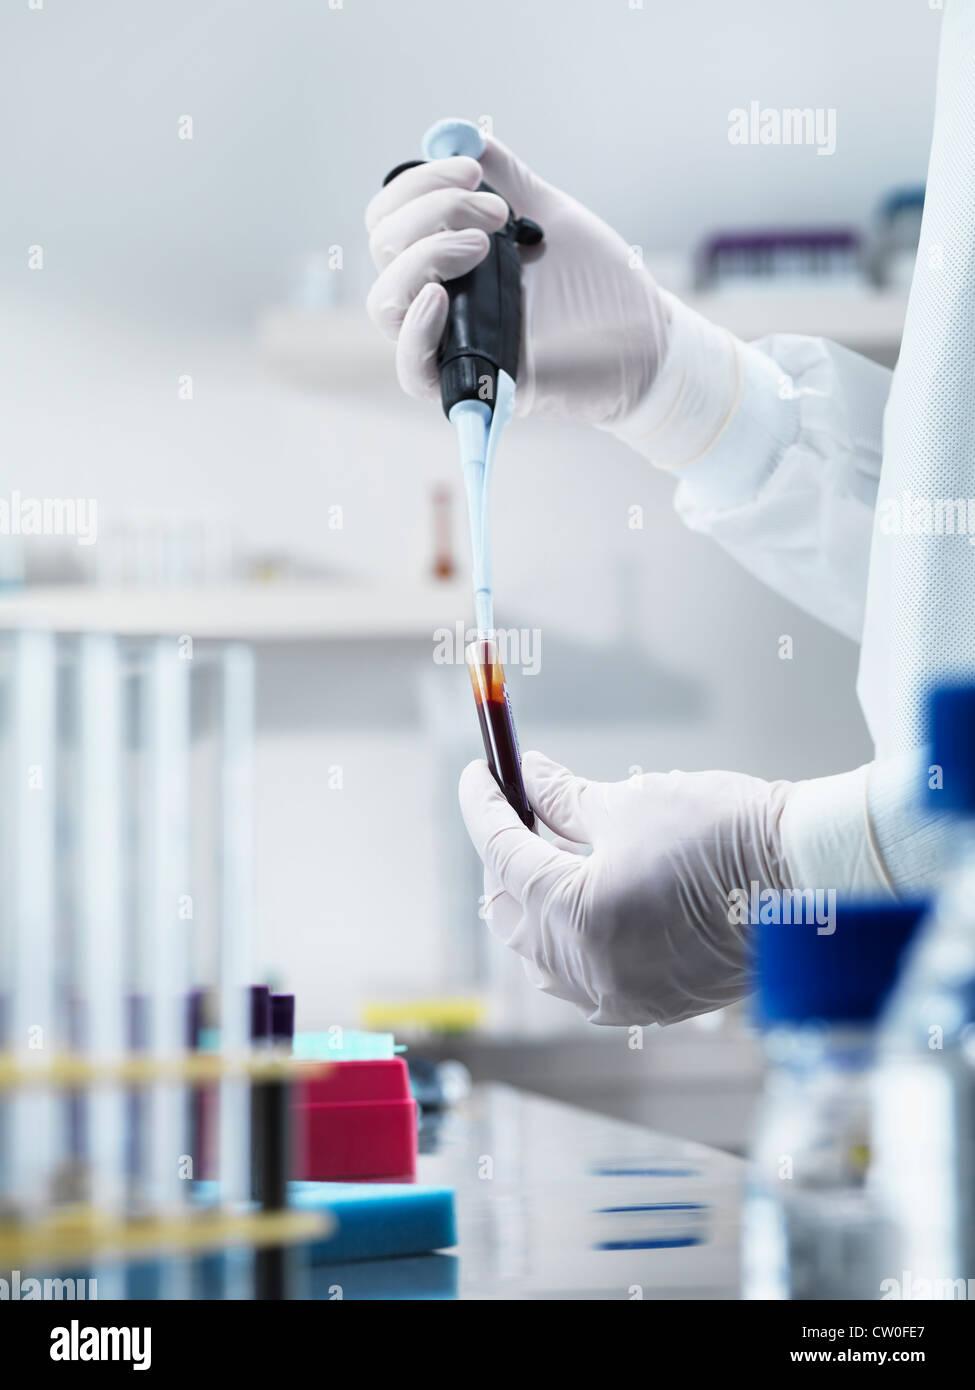 Scientist pipetting liquid in test tube Stock Photo